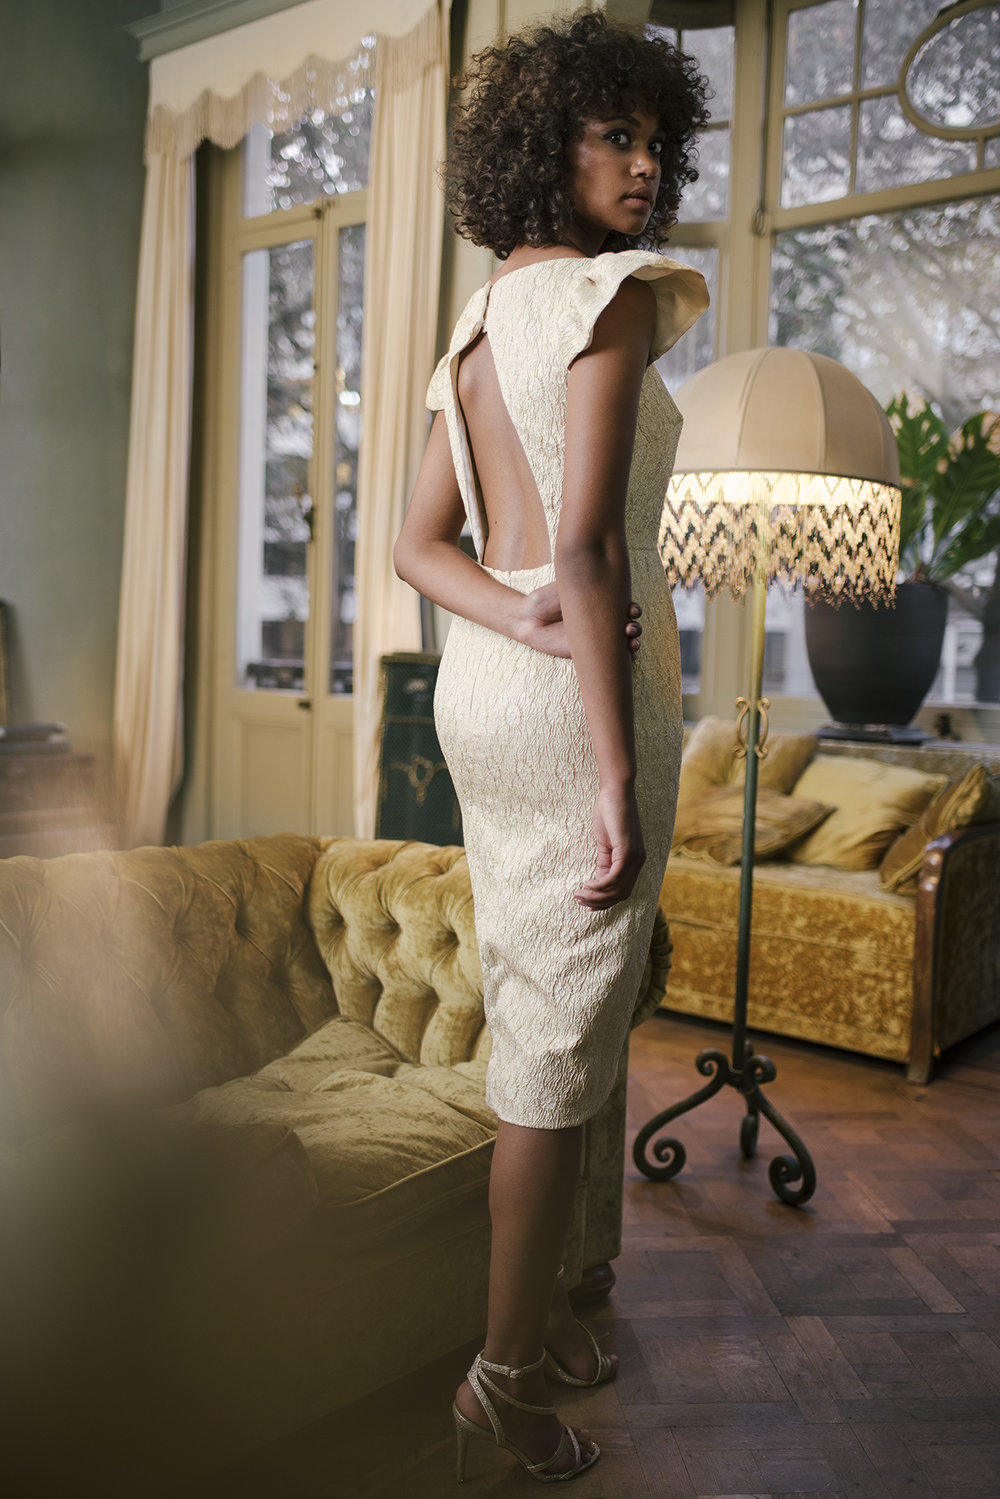 valentine-avoh-robe-mariee-lena-wedding-dress-bruxelles-photo-elodie-timmermans-56.jpg